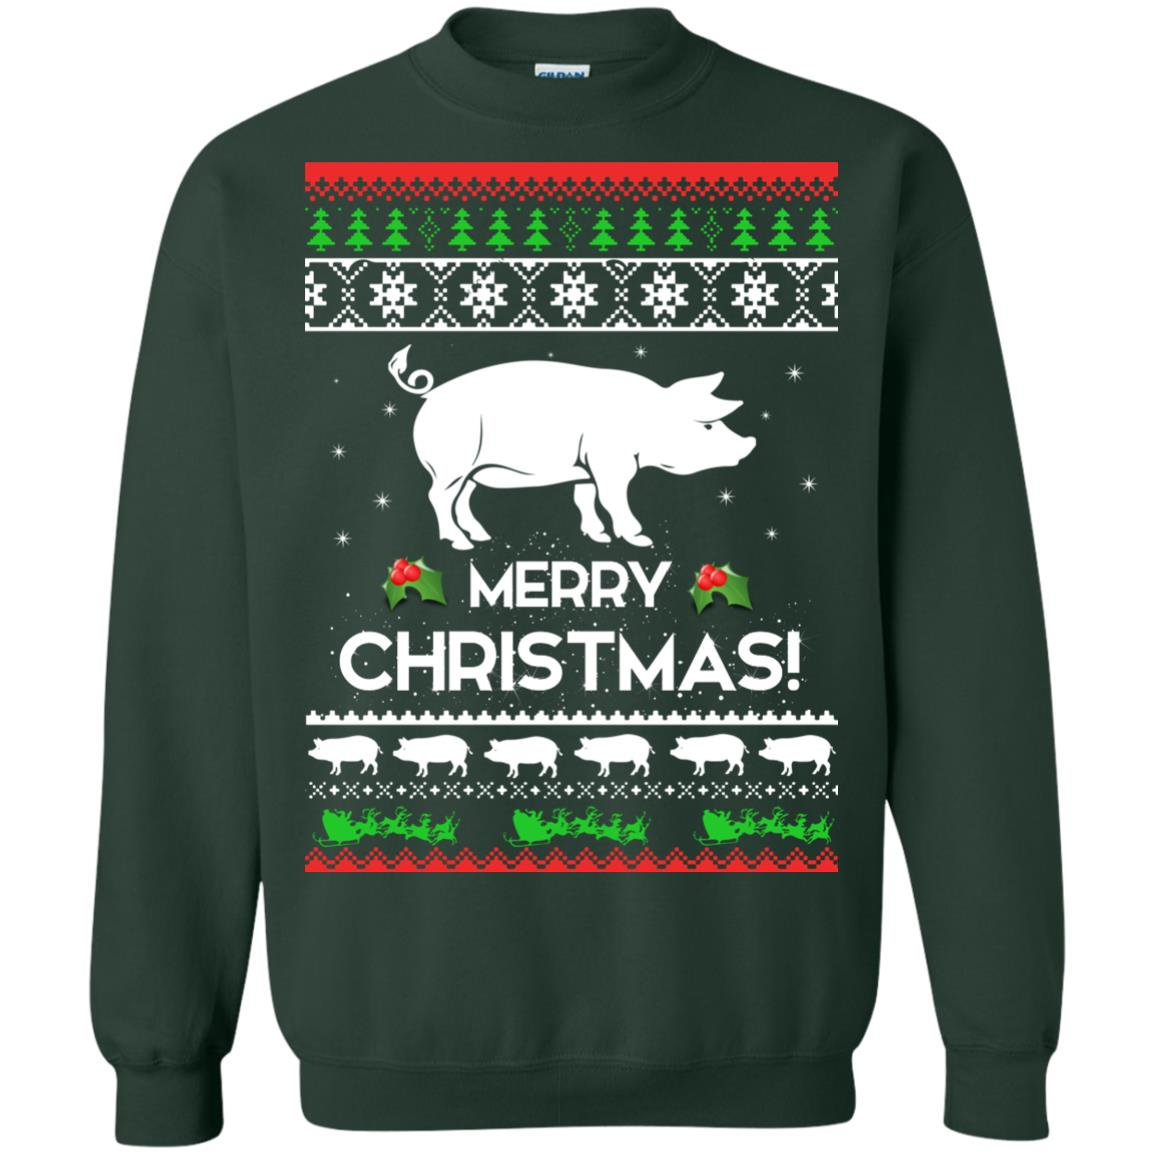 image 3881 - Merry Pigmas Christmas Pig Ugly Sweater, Shirt